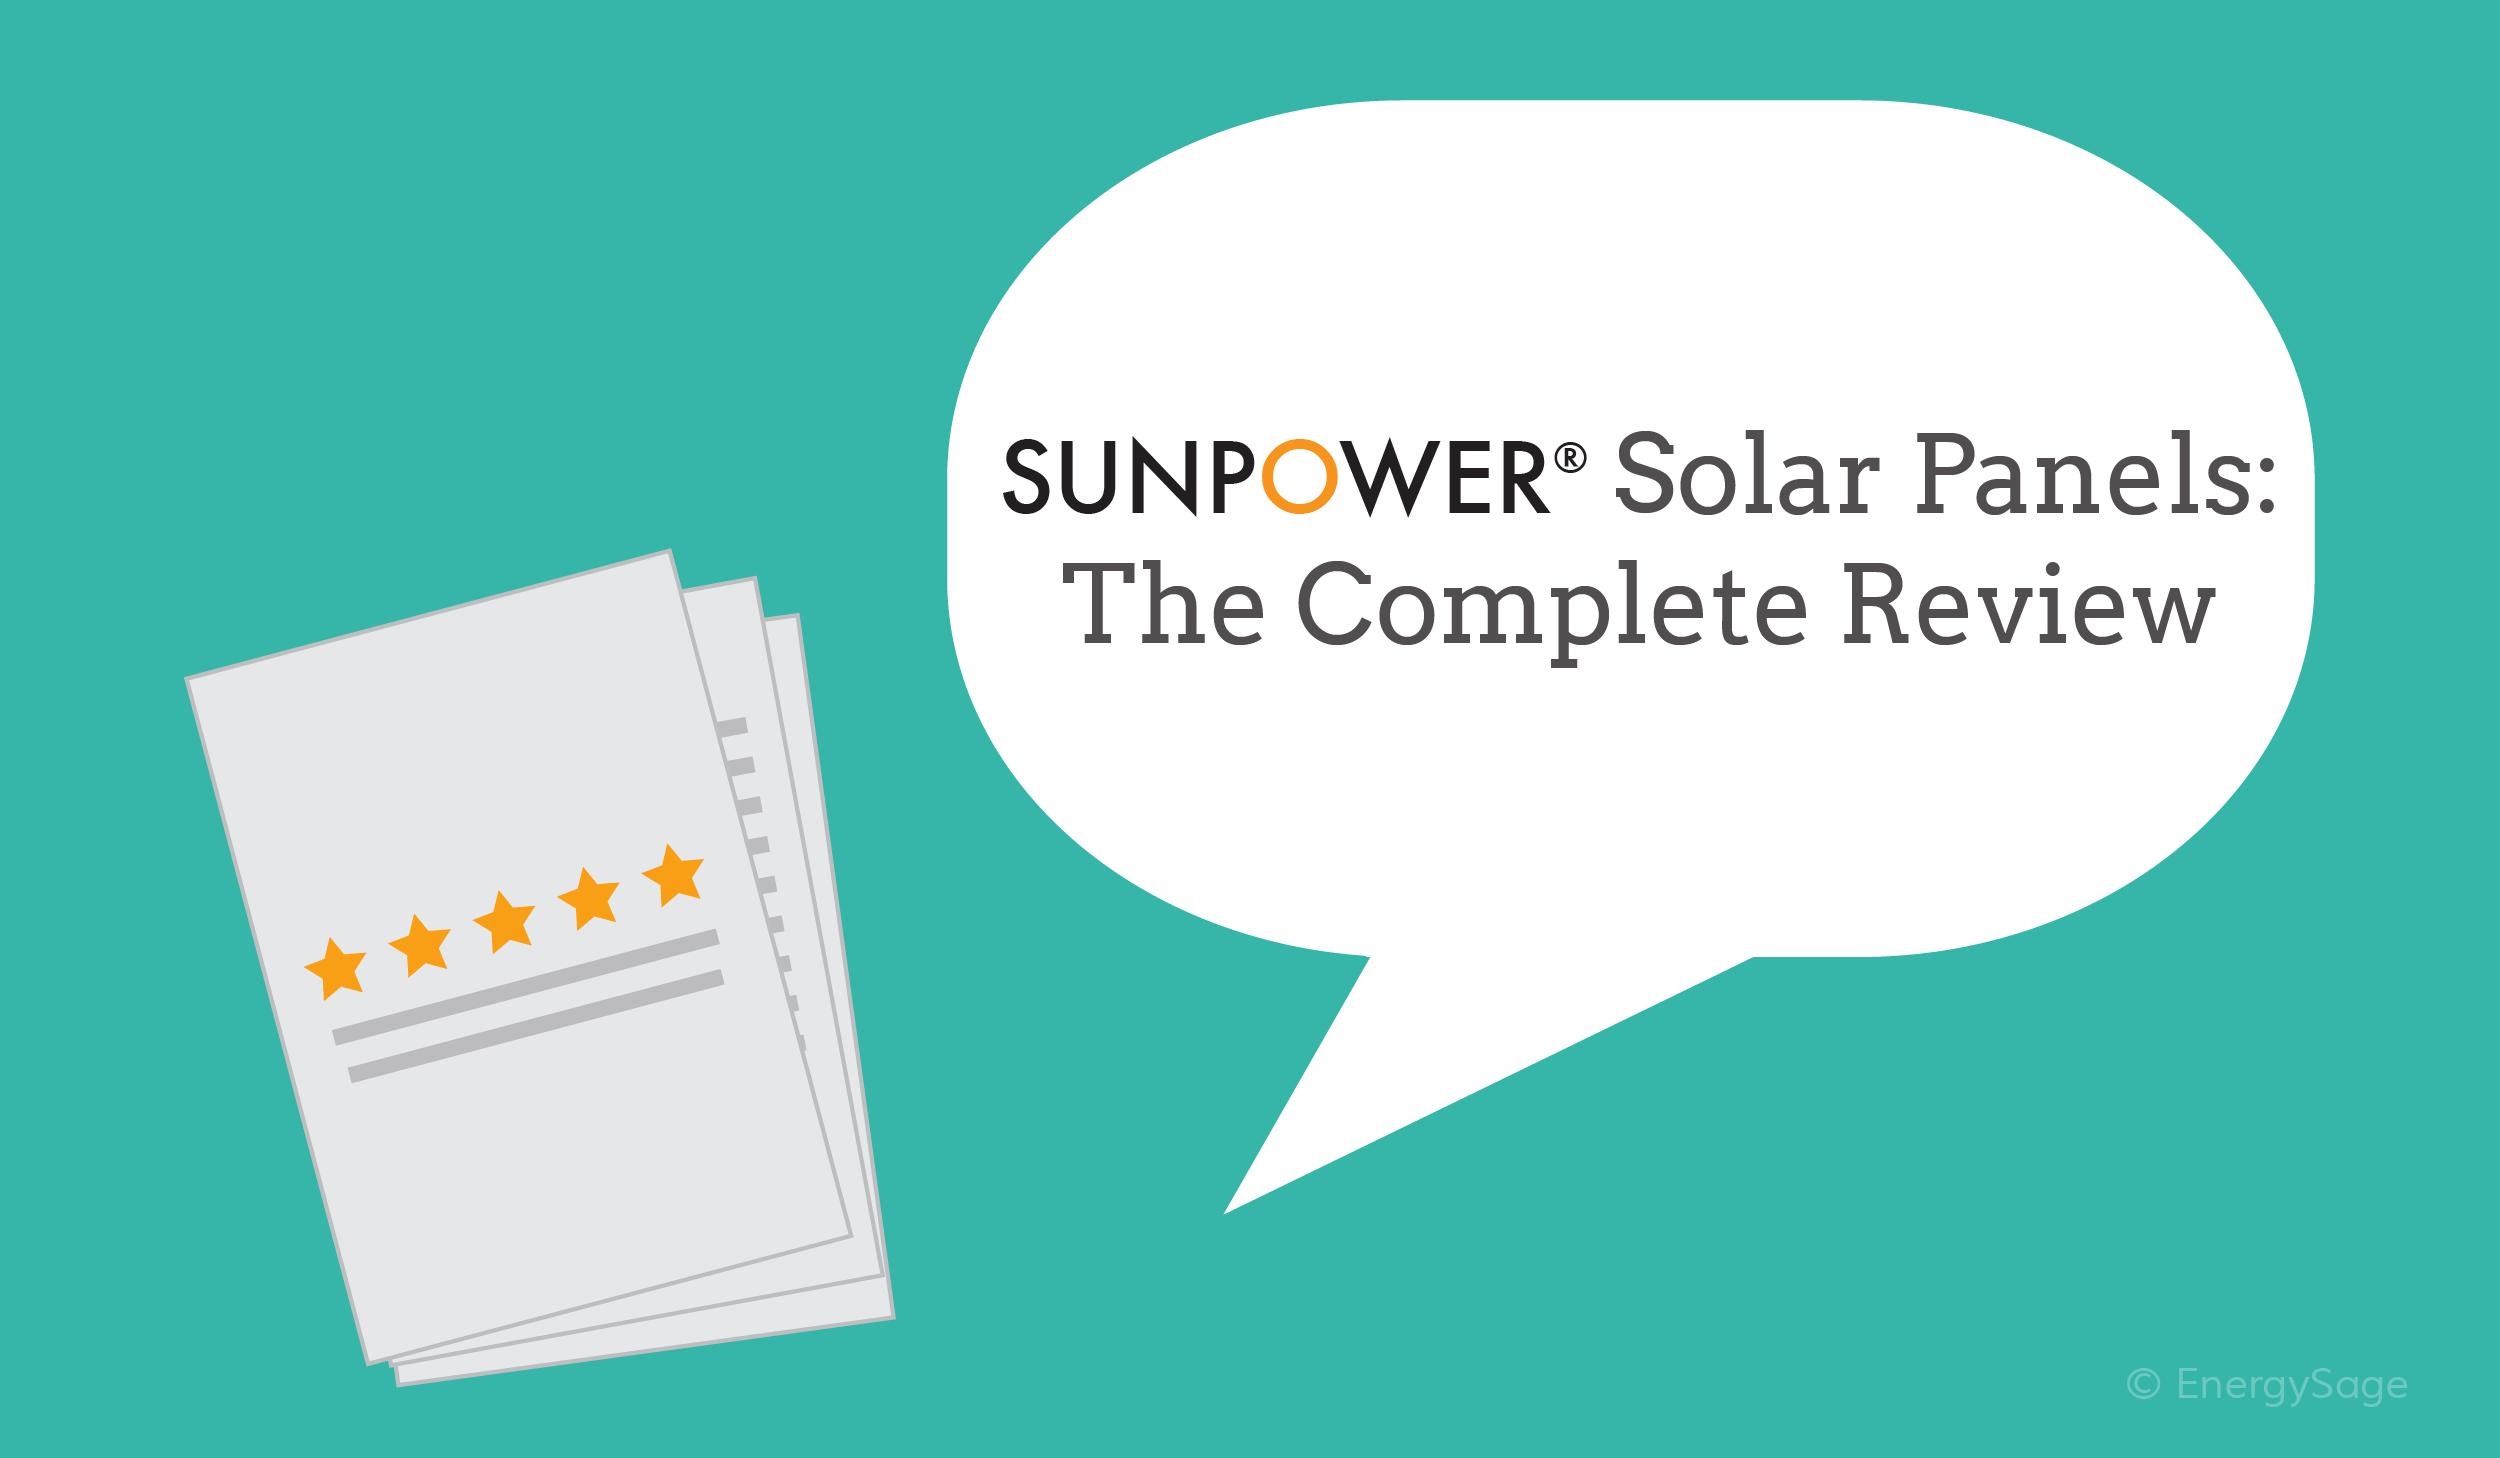 Sunpower Solar Panels 2018 The Complete Review Energysage